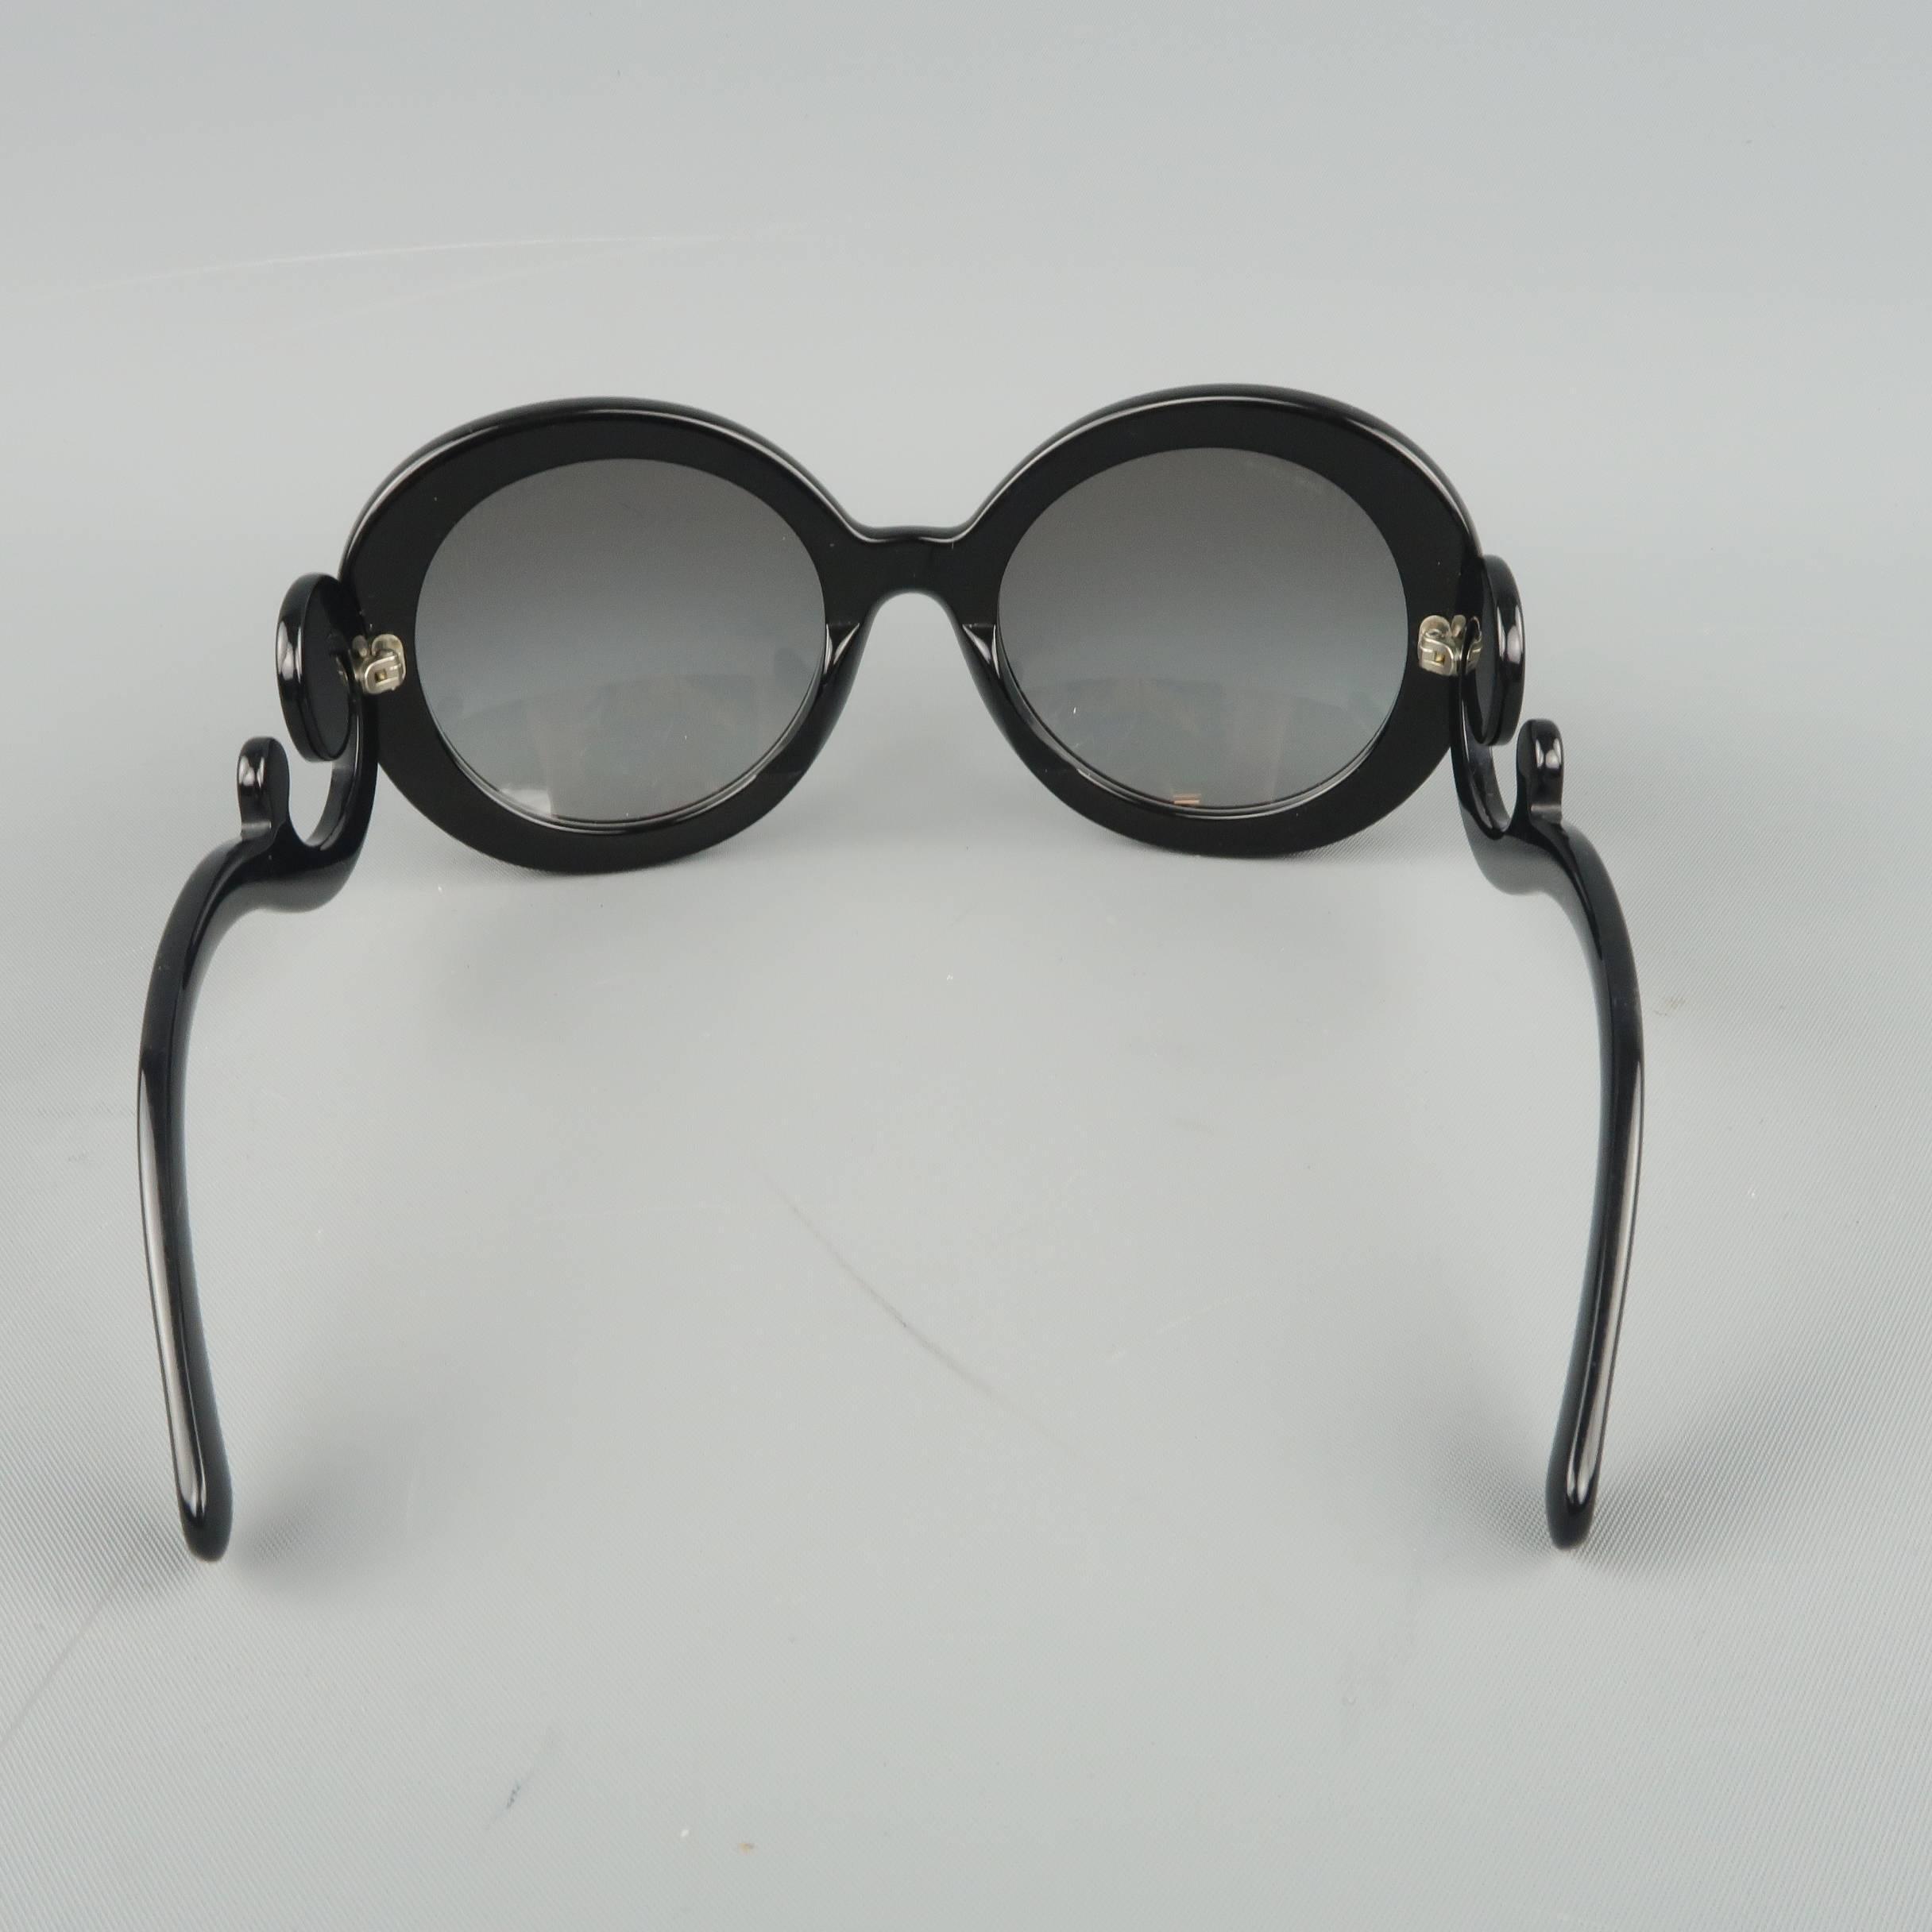 3e8923b54f32 ... sale official store prada black round lens baroque swirl arm sunglasses  for sale 2 91757 2d5c6